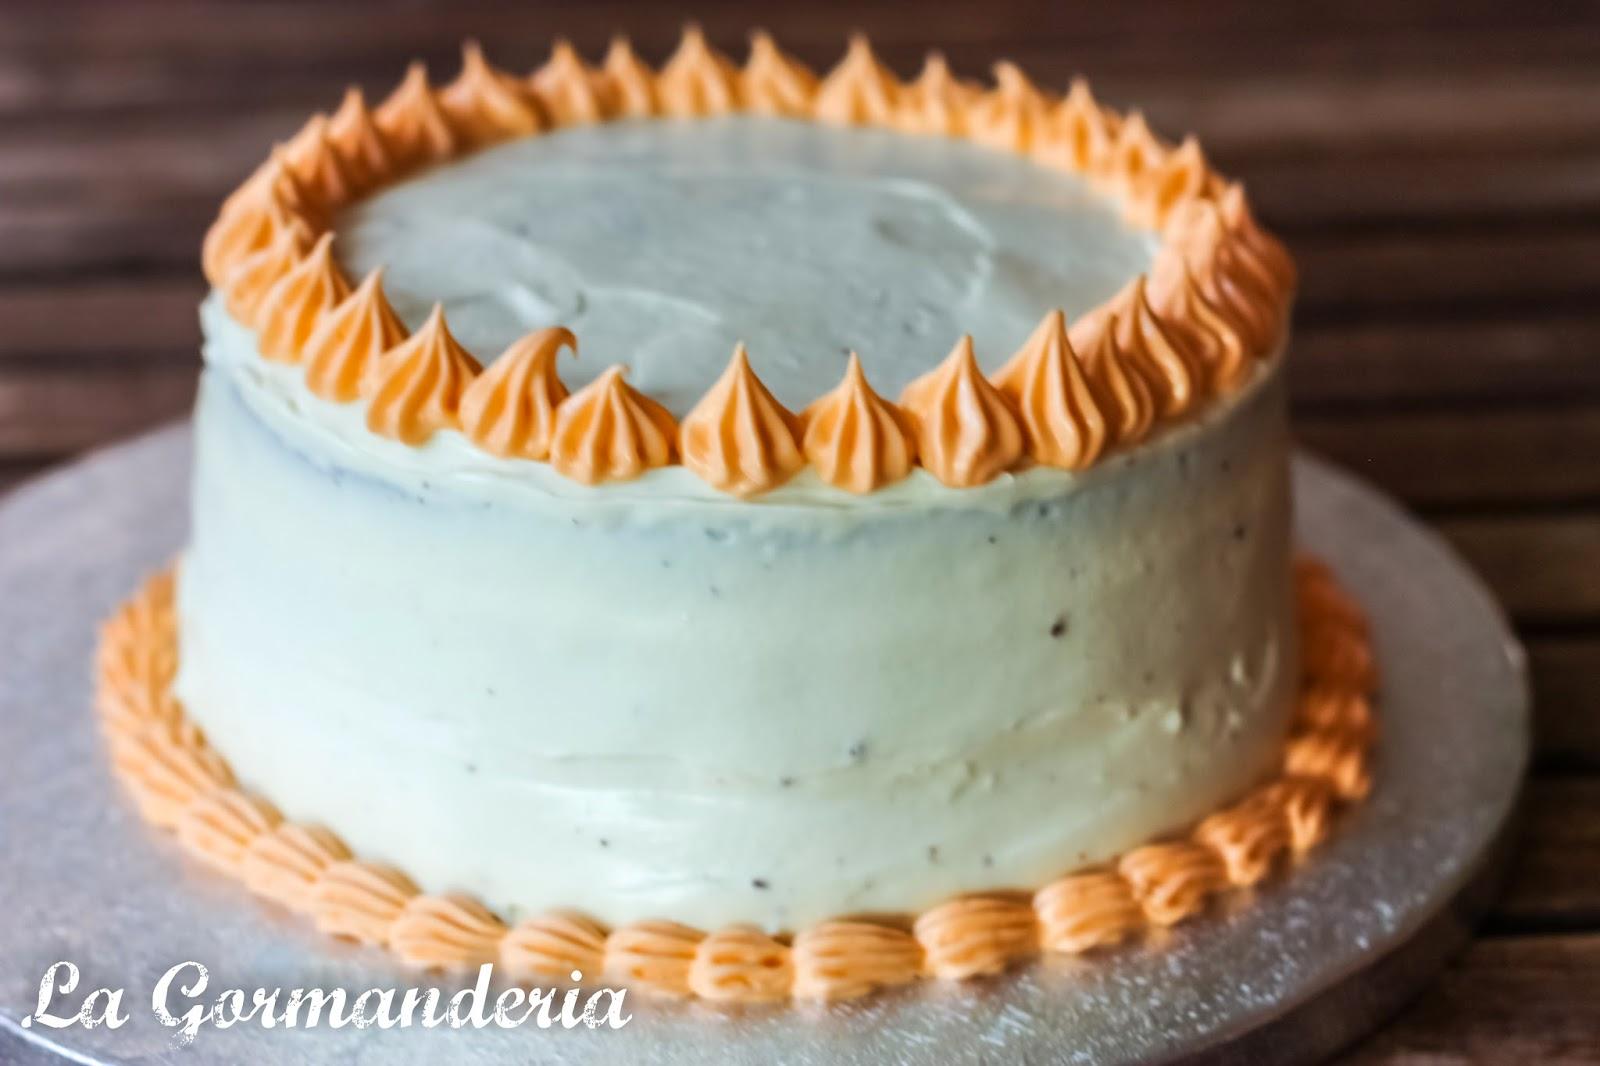 Tarta de chocolate con ganache de chocolate blanco